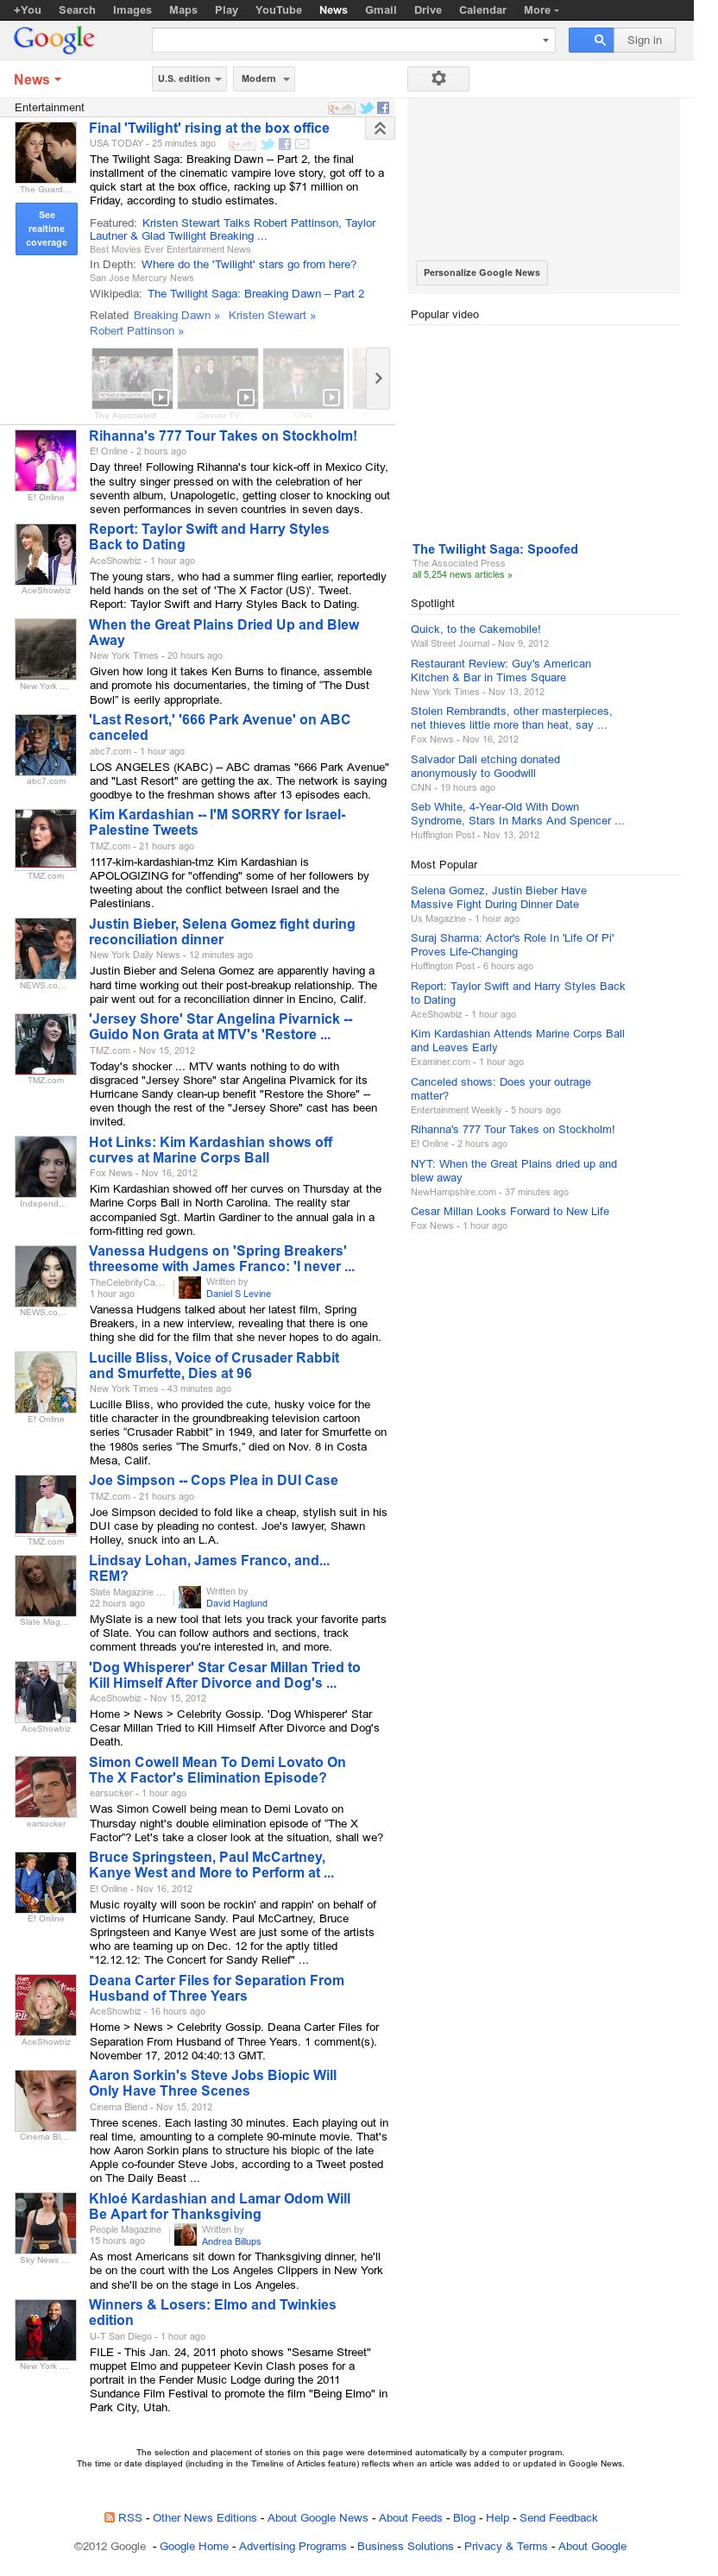 Google News: Entertainment at Saturday Nov. 17, 2012, 9:11 p.m. UTC